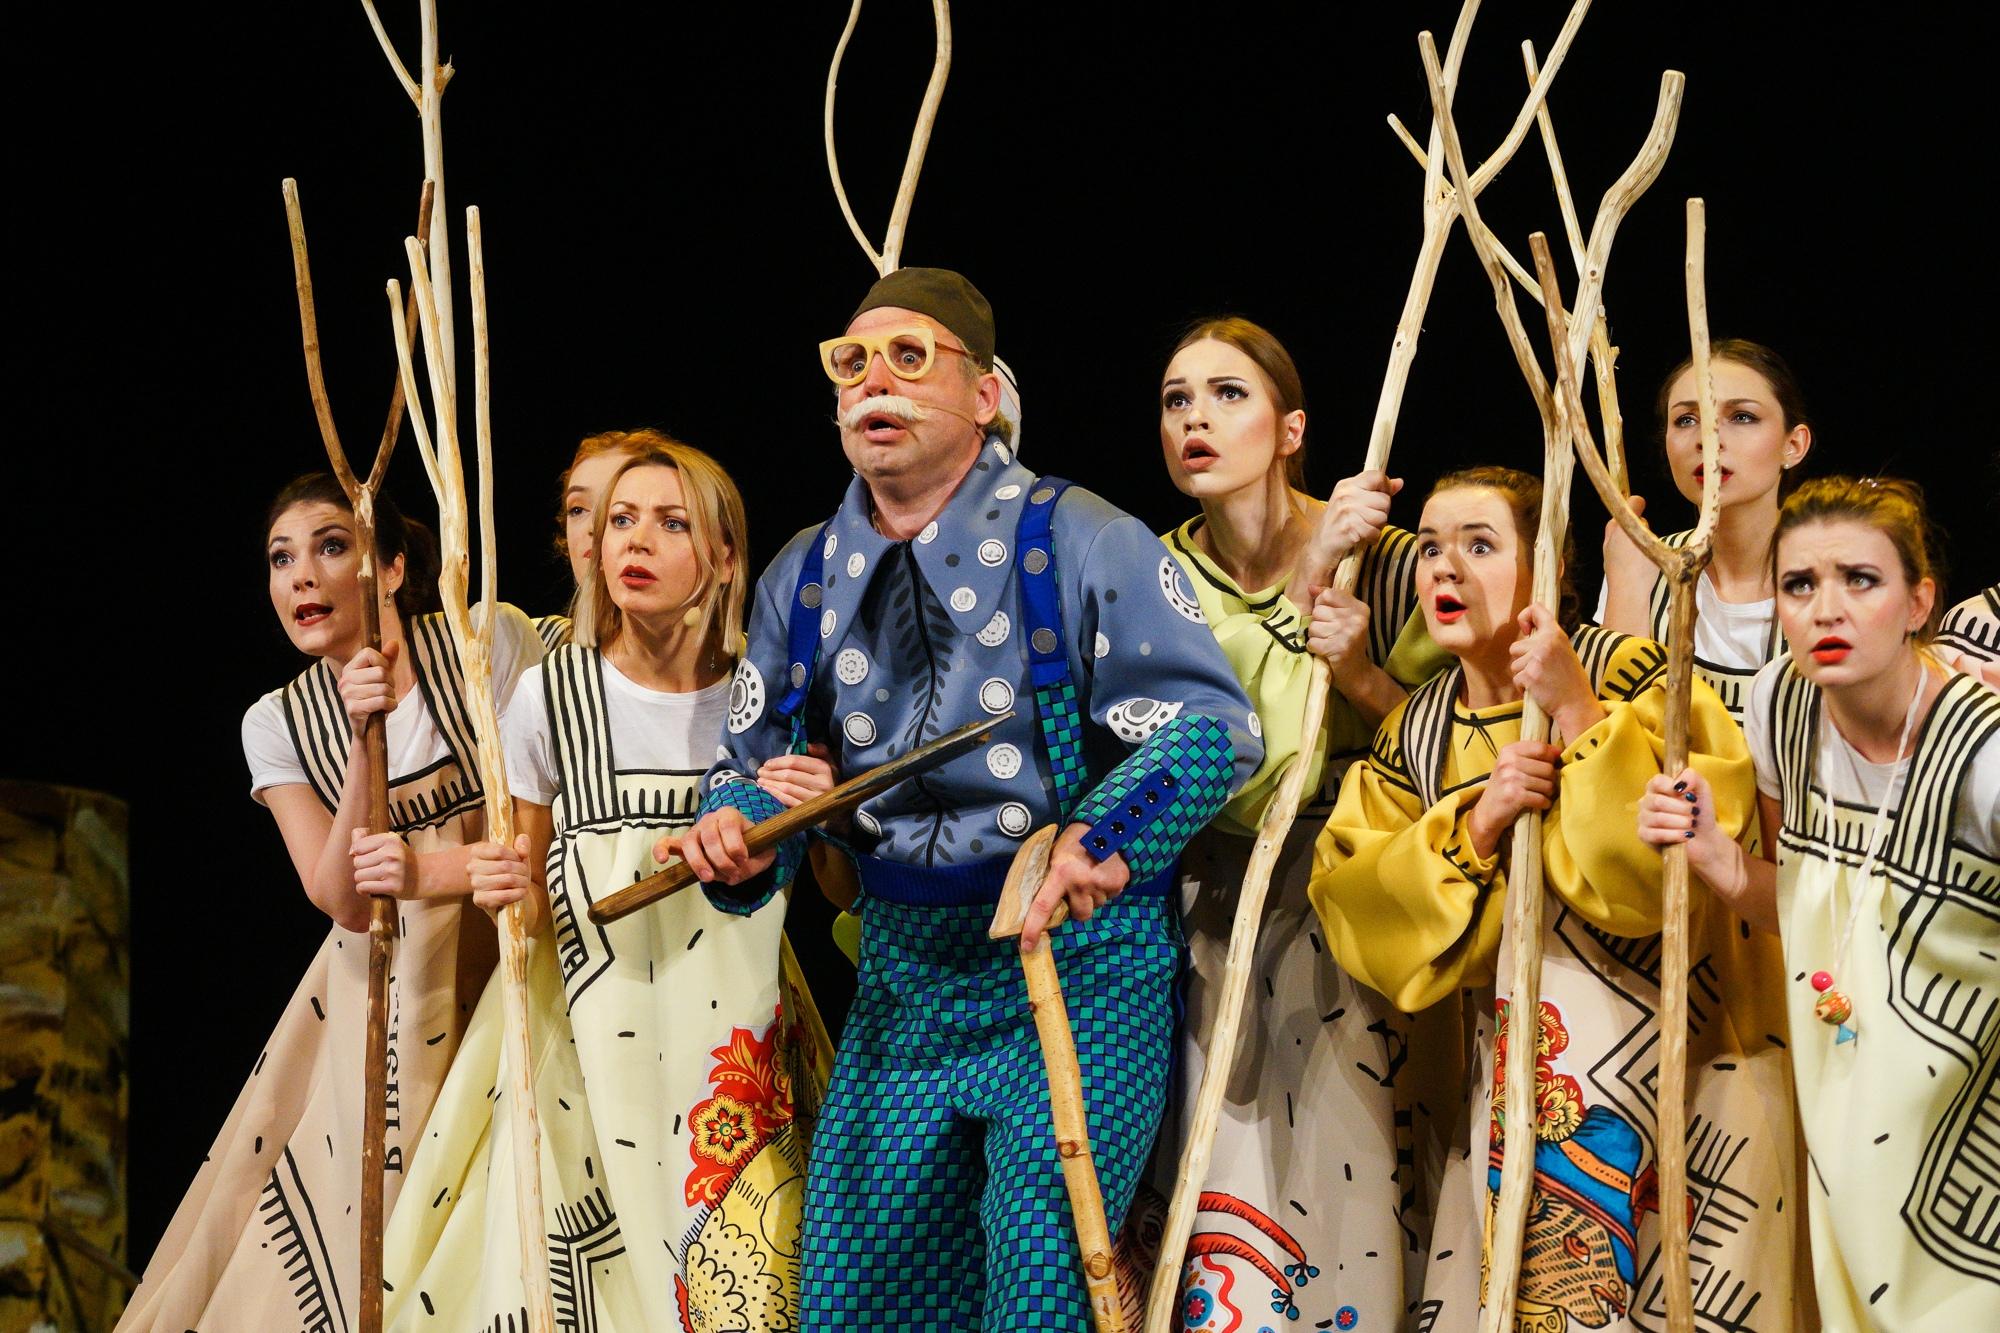 театр драма купить билеты онлайн